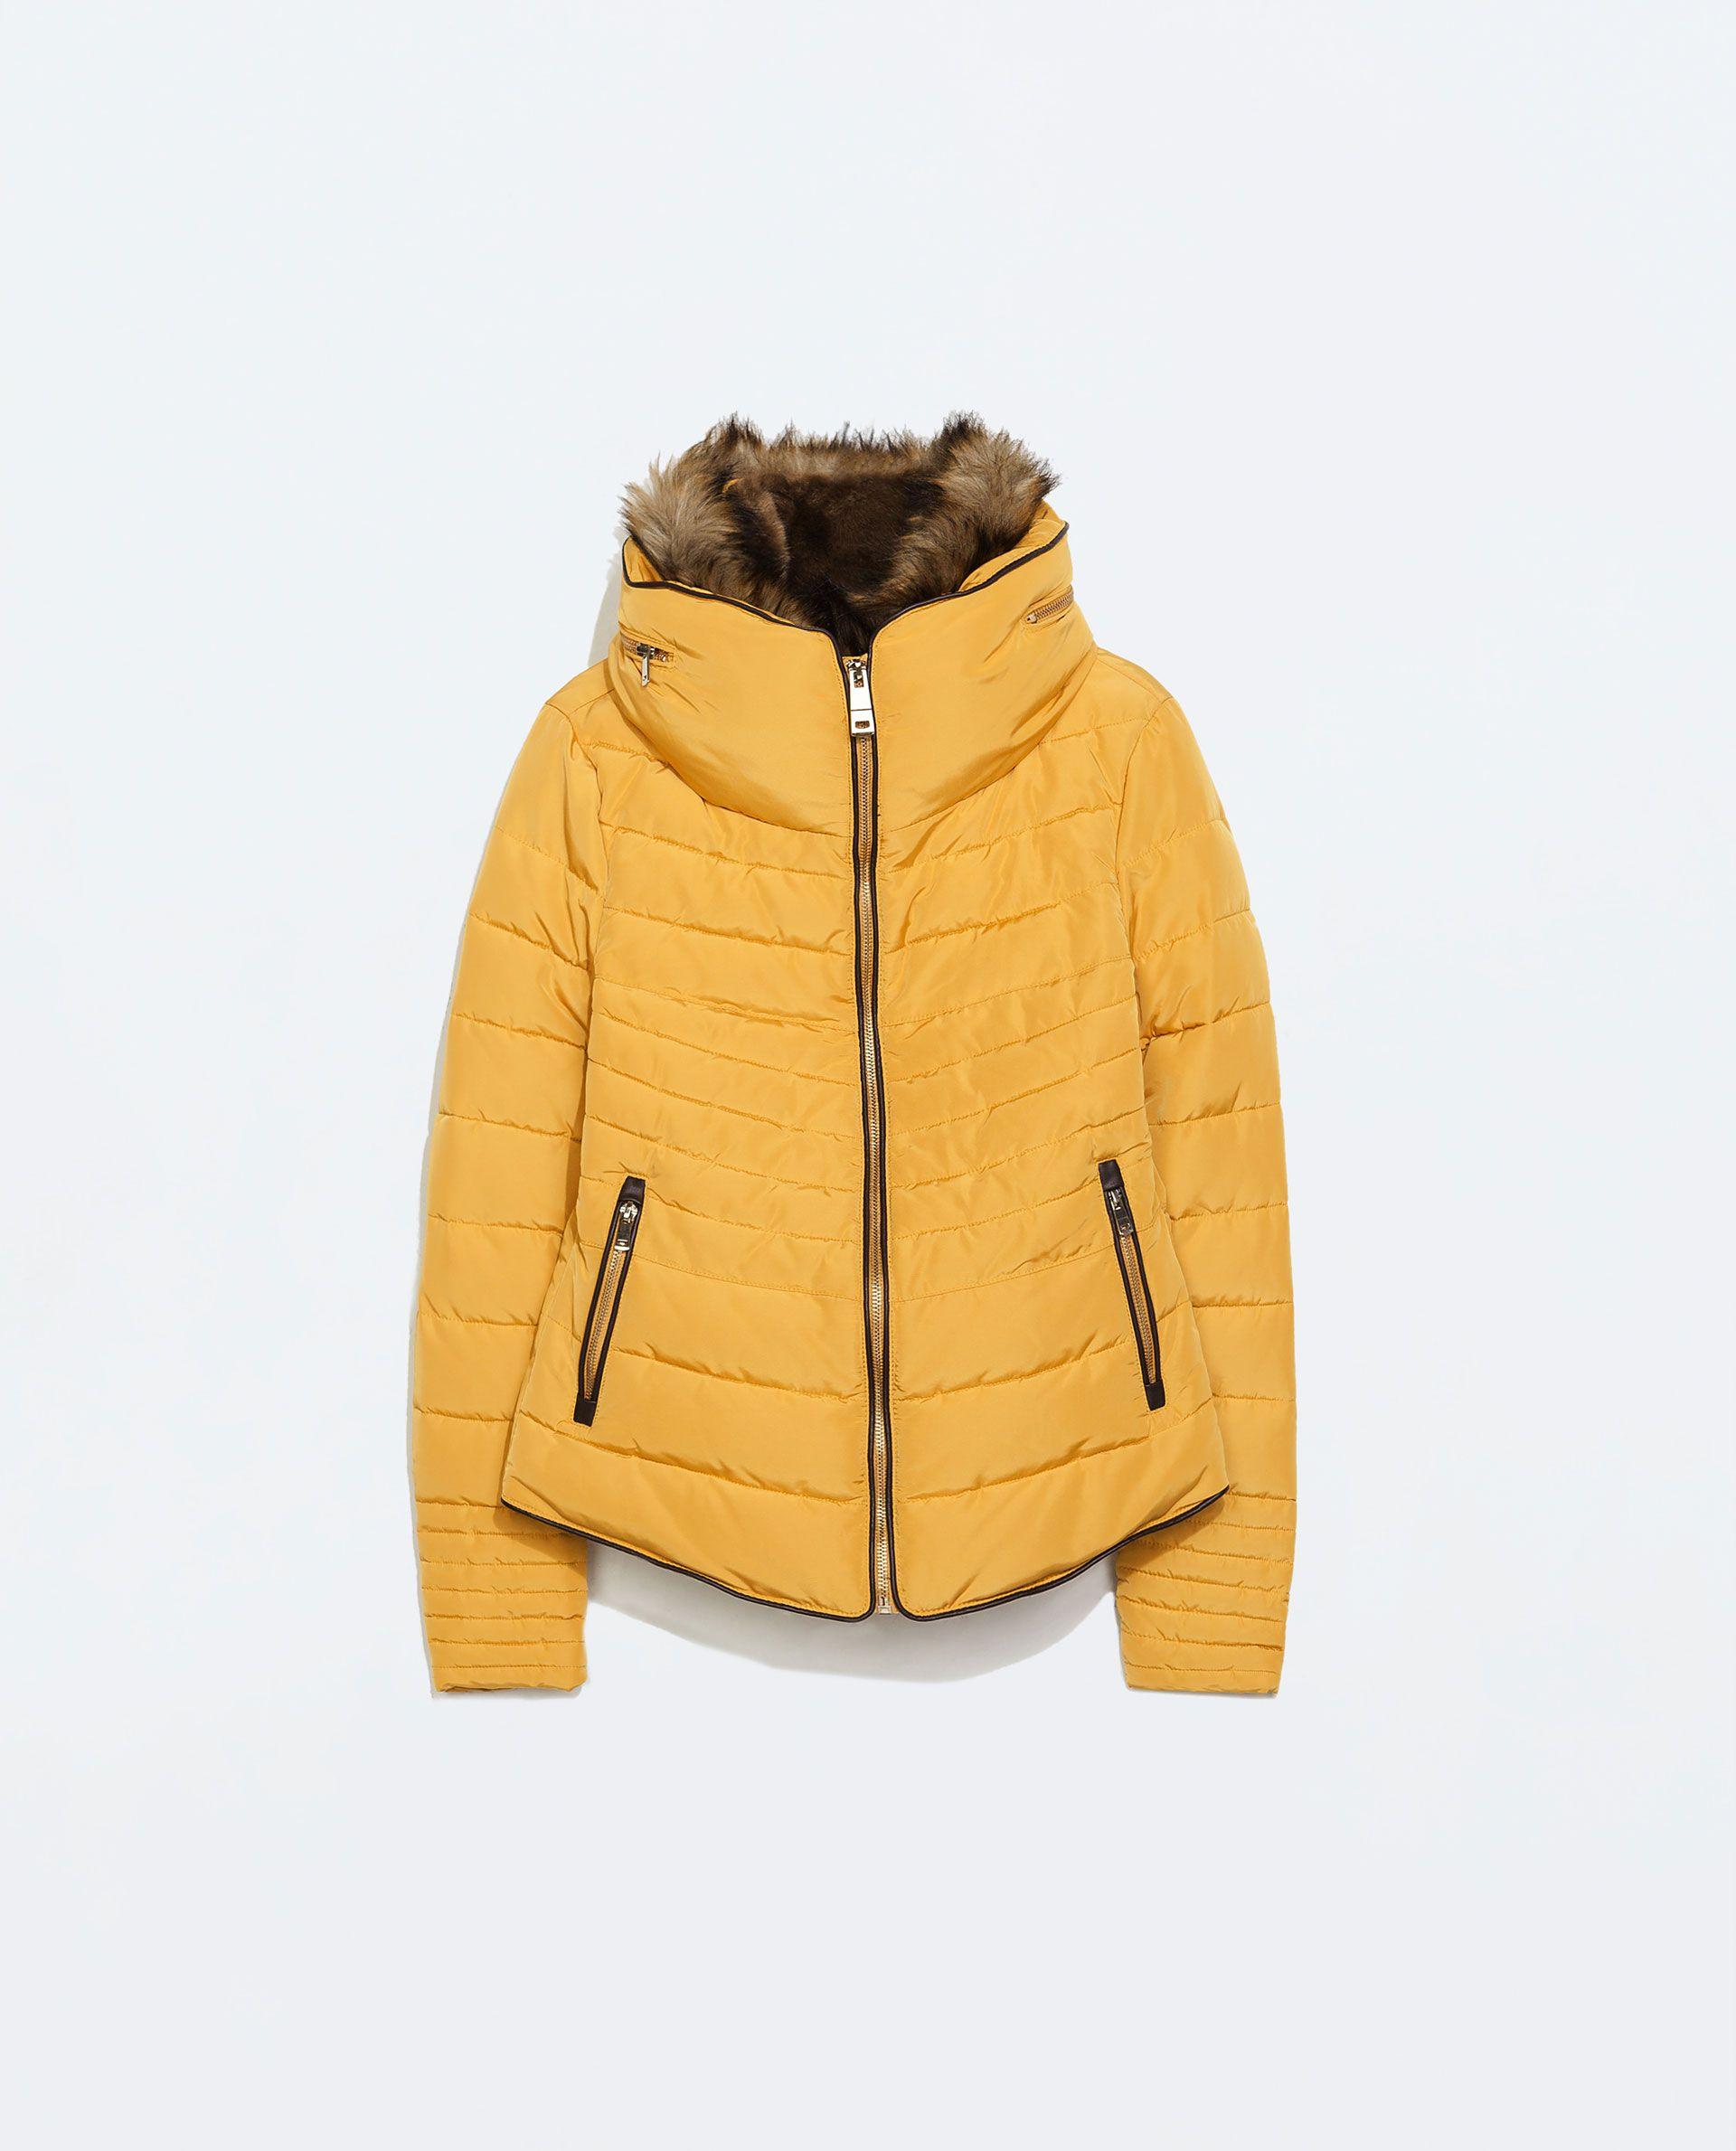 Short Anorak With Fur Collar Outerwear Woman Zara United